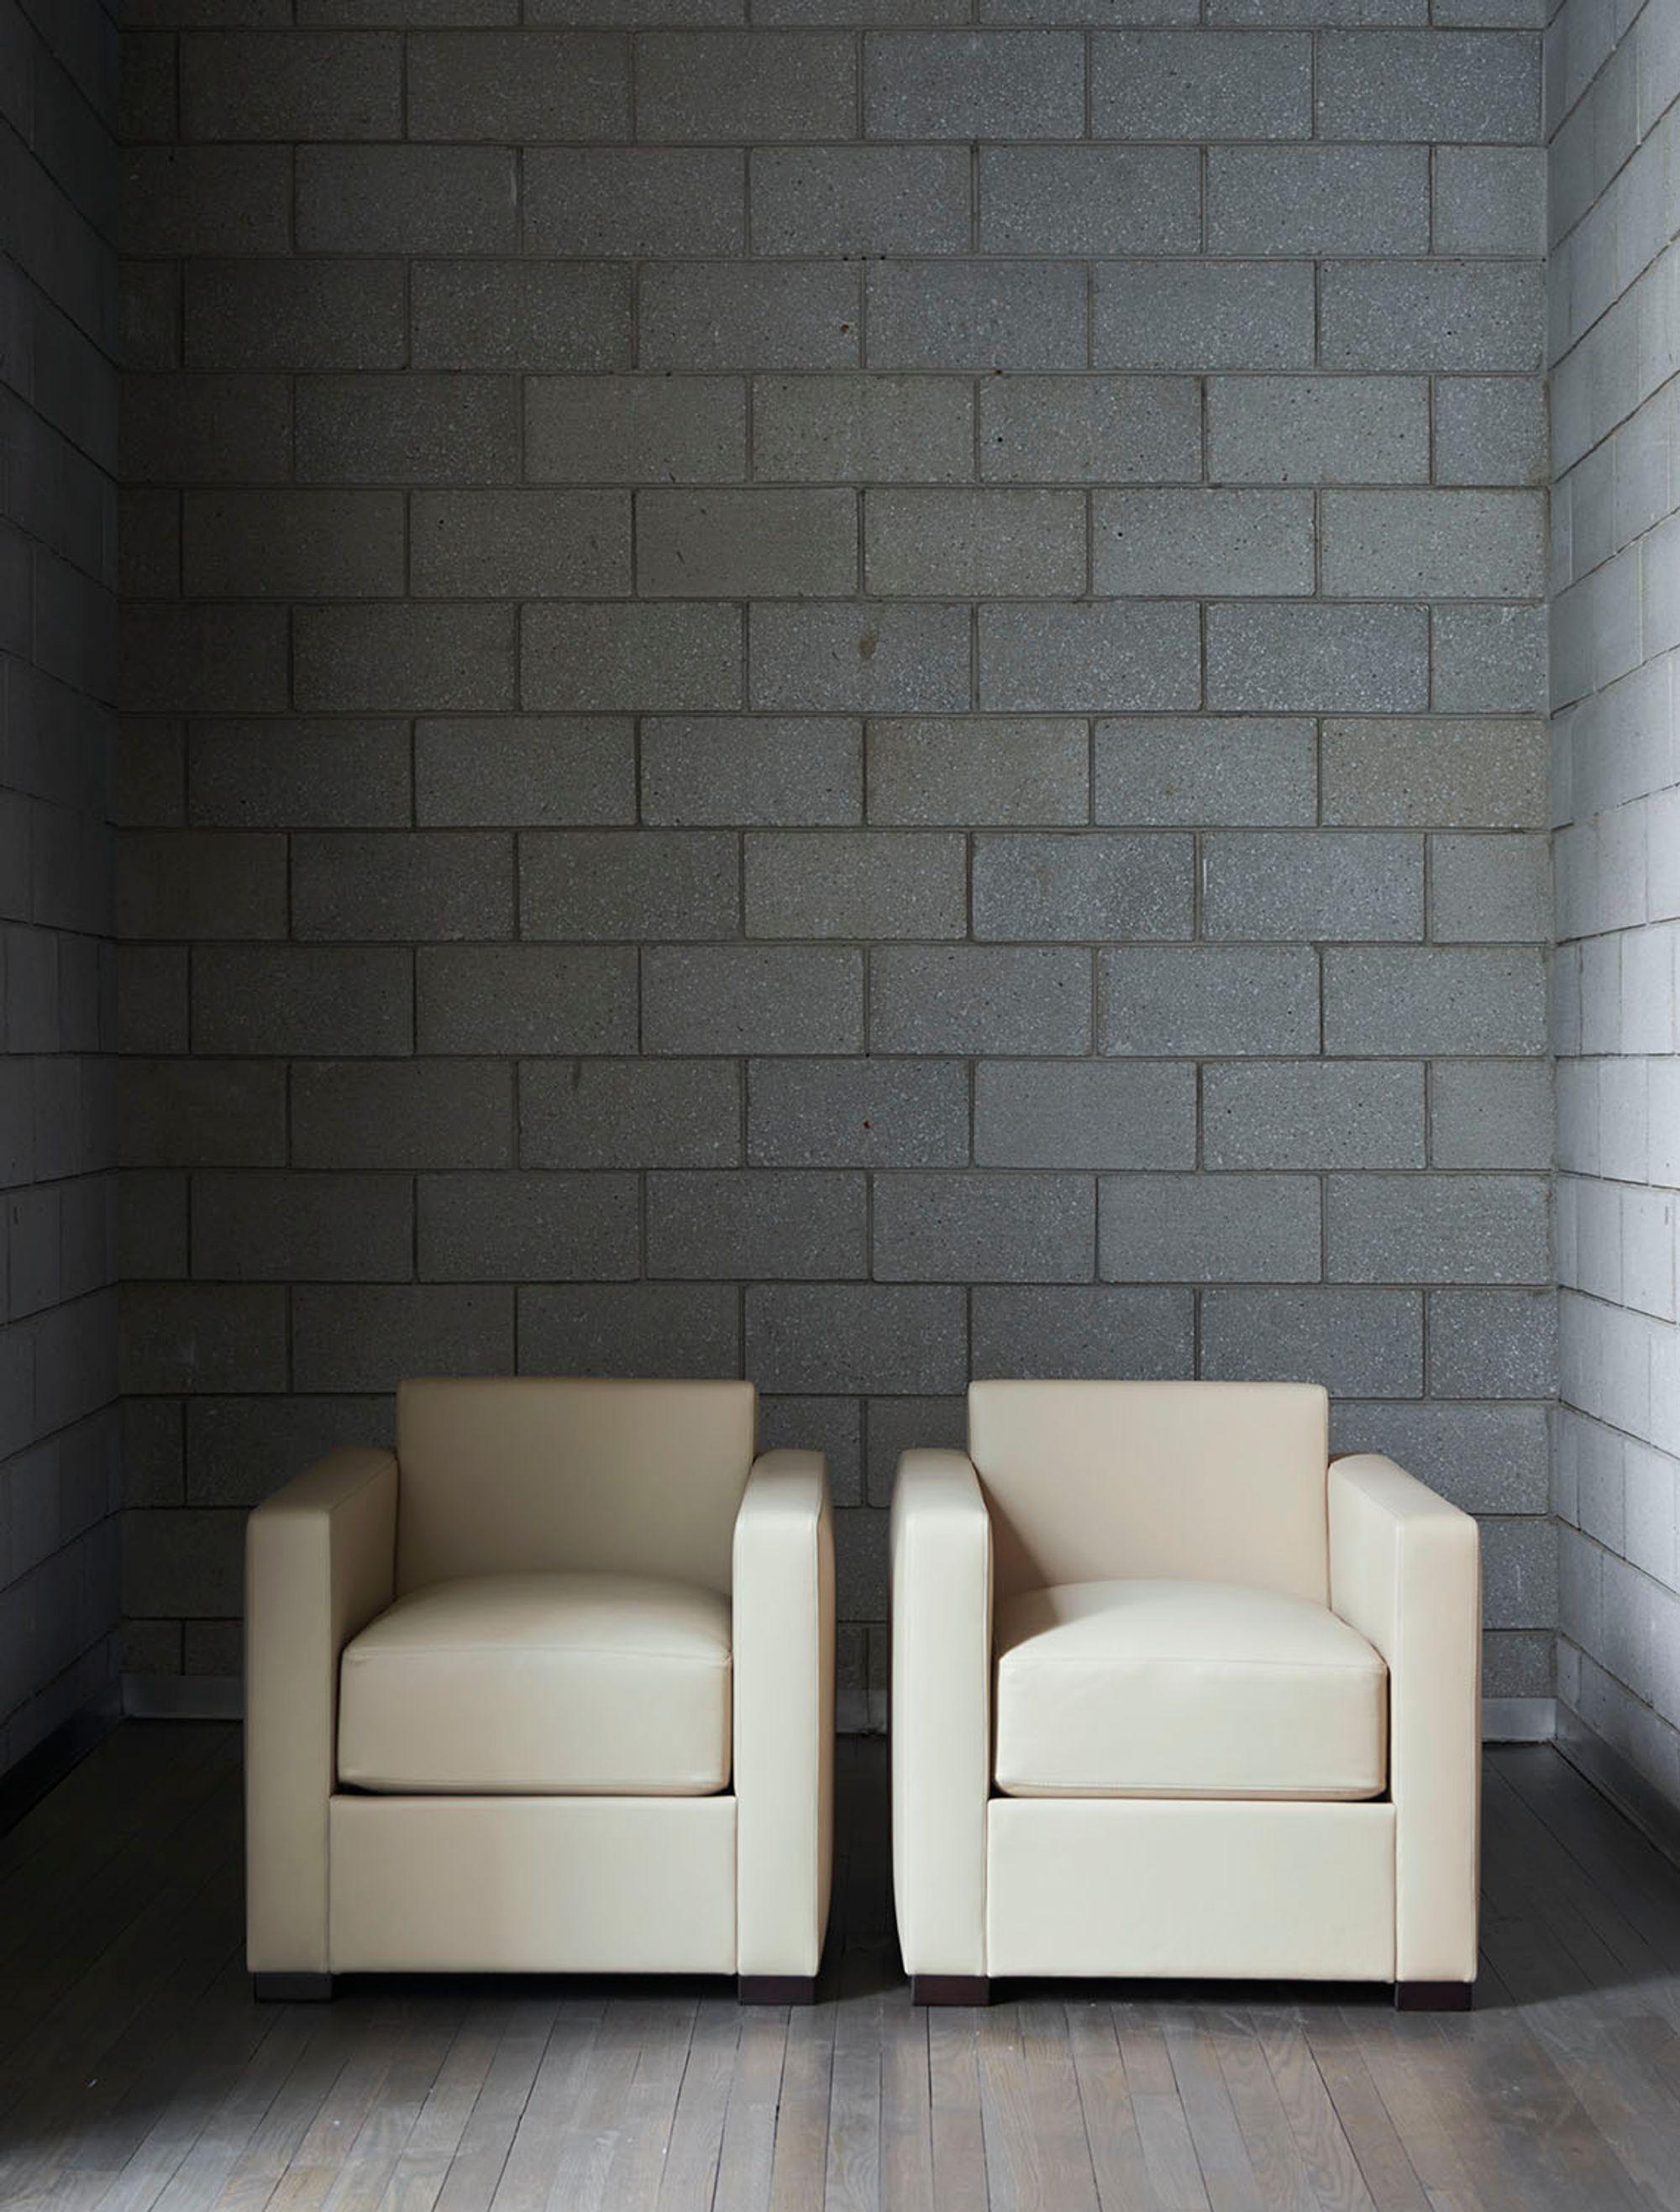 Project Image for Linea A with Poltrona Frau